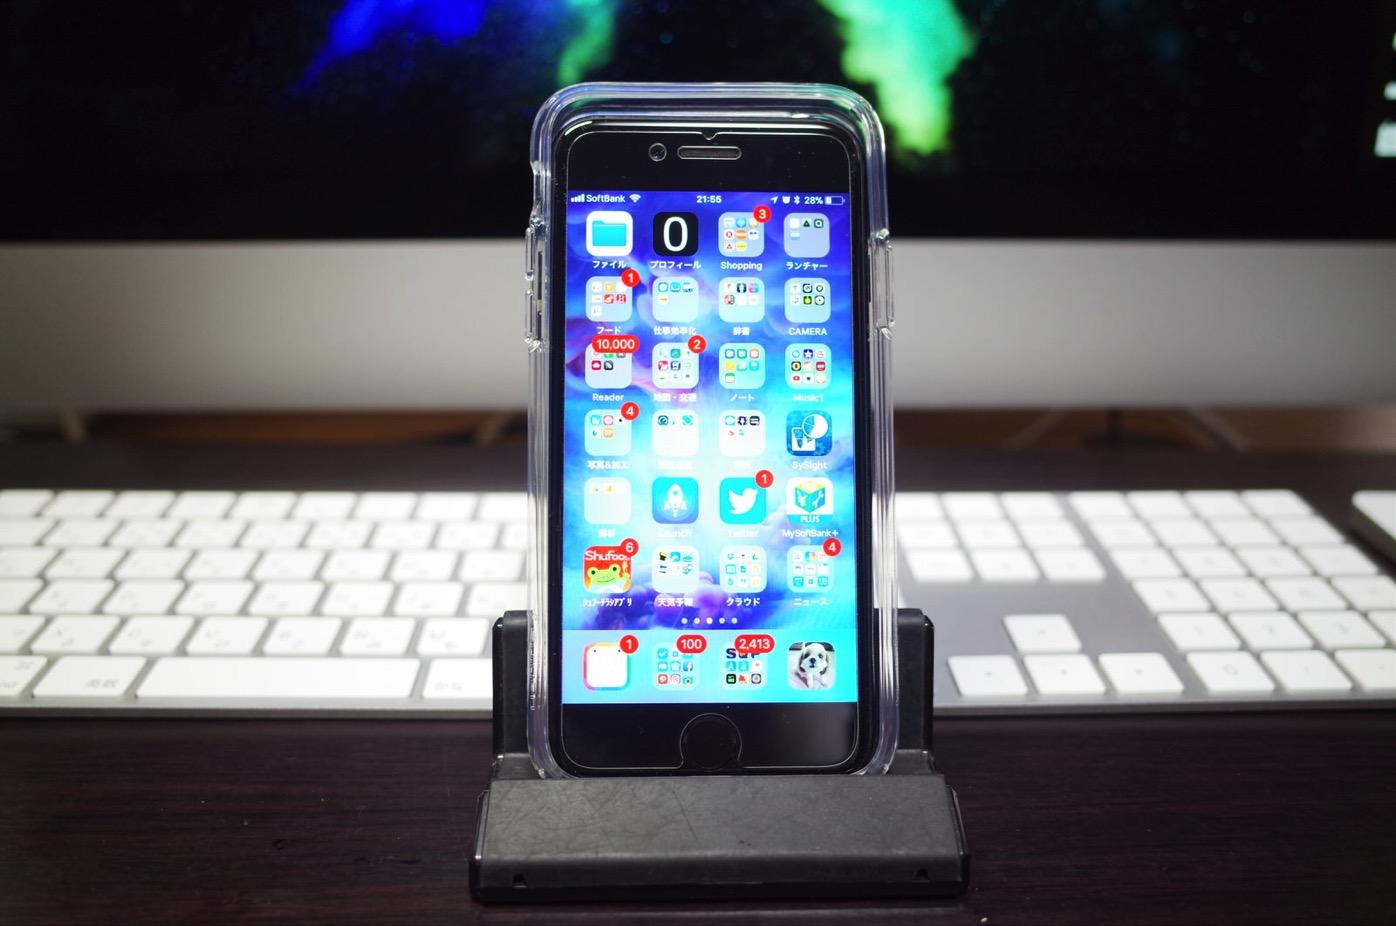 【Spigen】iPhone X ケース, [ 米軍MIL規格取得 落下 衝撃 吸収 ] ウルトラ・ハイブリッド アイフォン X 用 耐衝撃 カバー-11